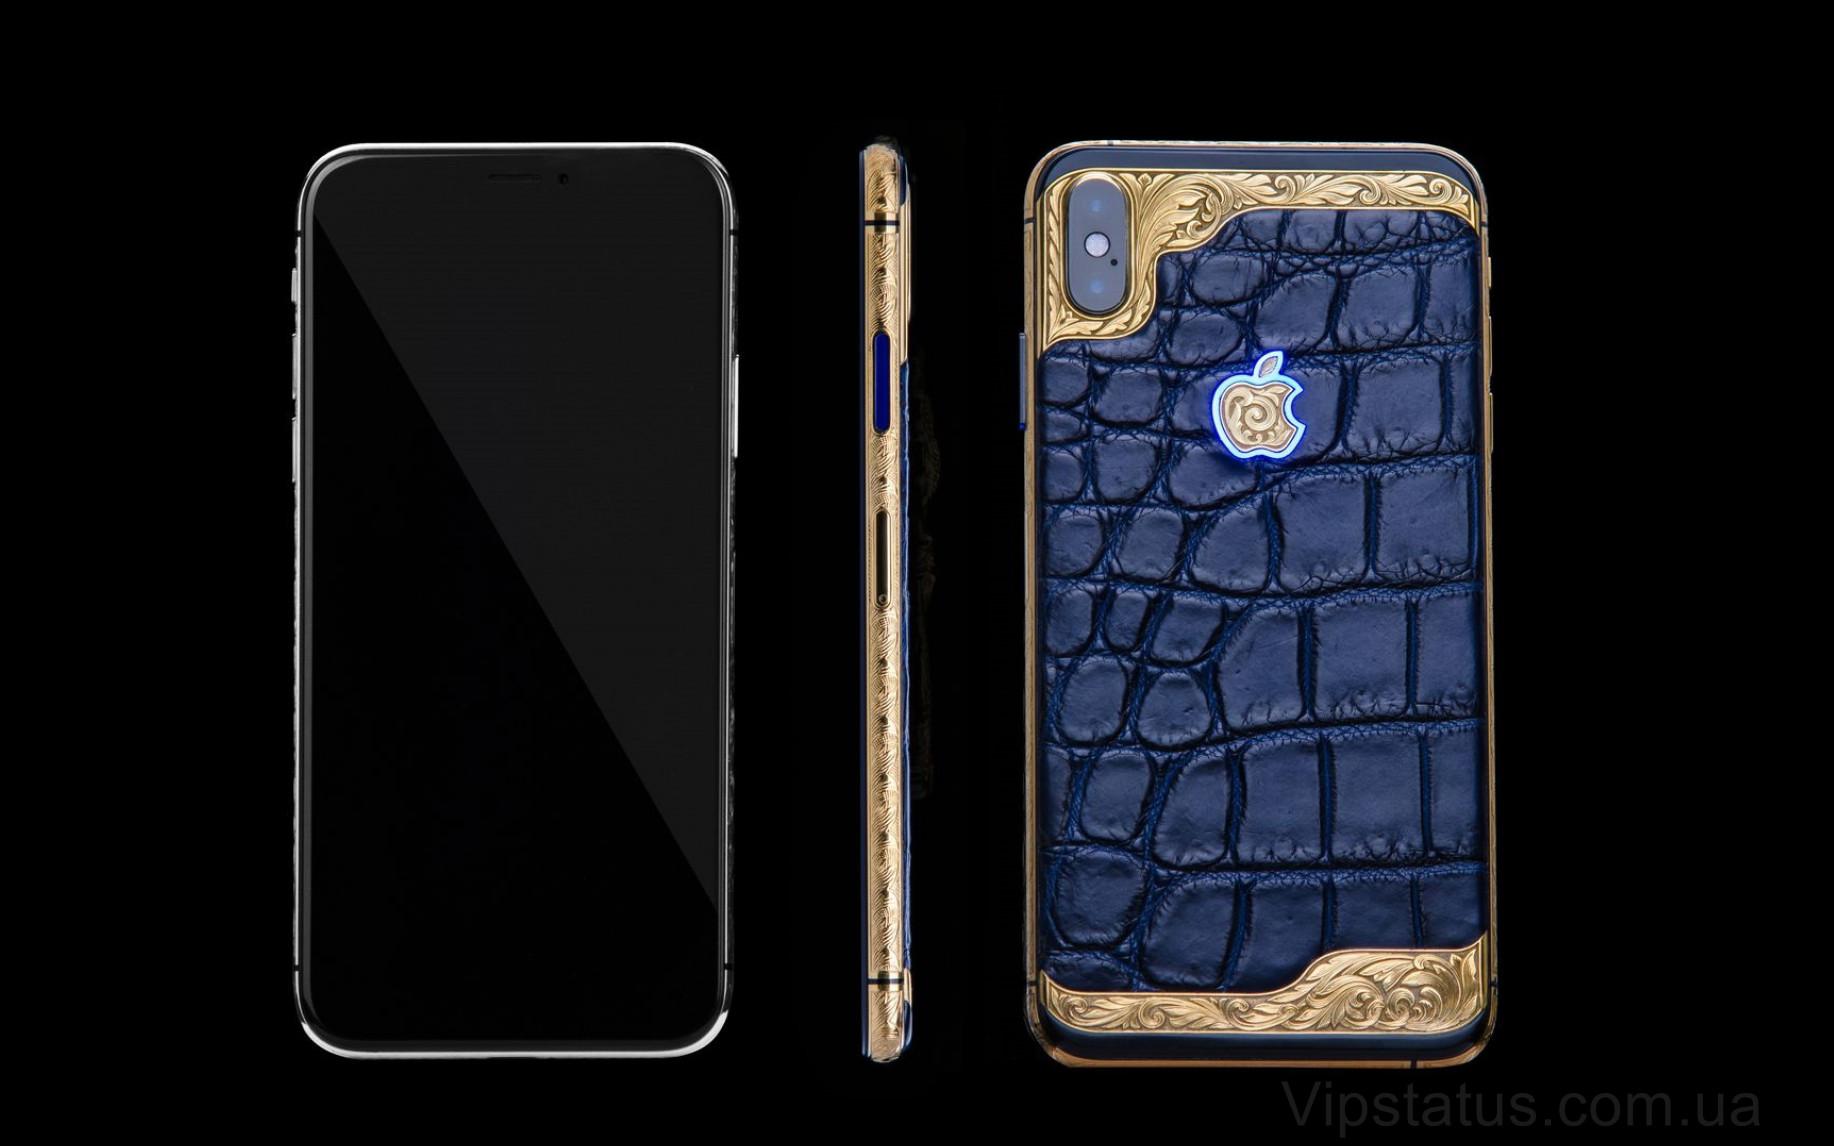 Elite Sapphire Star IPHONE XS 512 GB Sapphire Star IPHONE XS 512 GB image 7